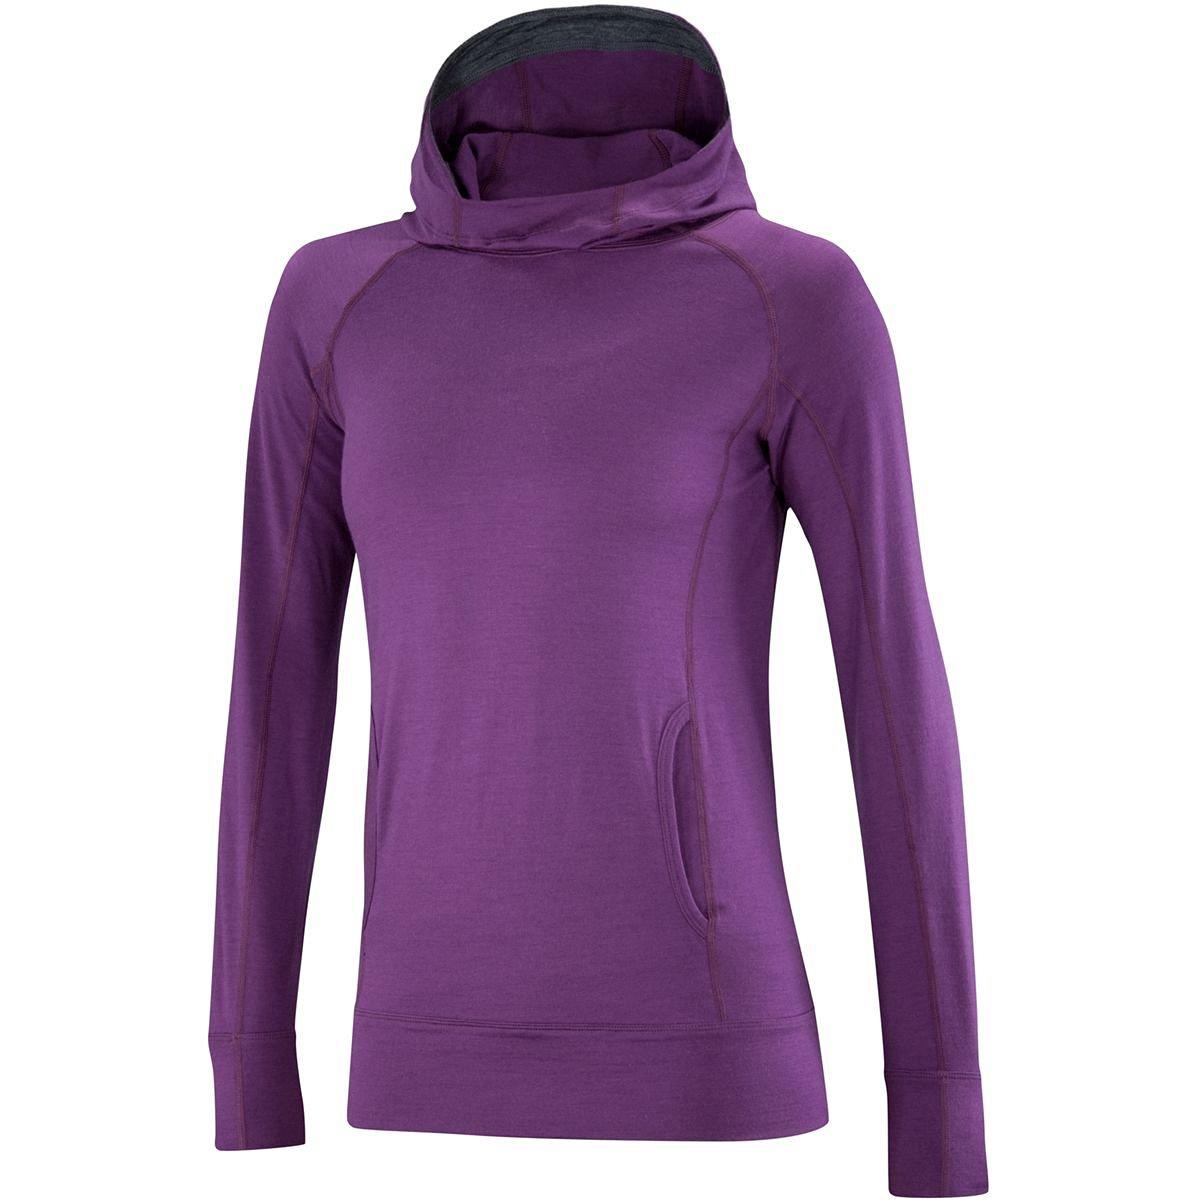 Ibex Outdoor Clothing Indie hera hoody